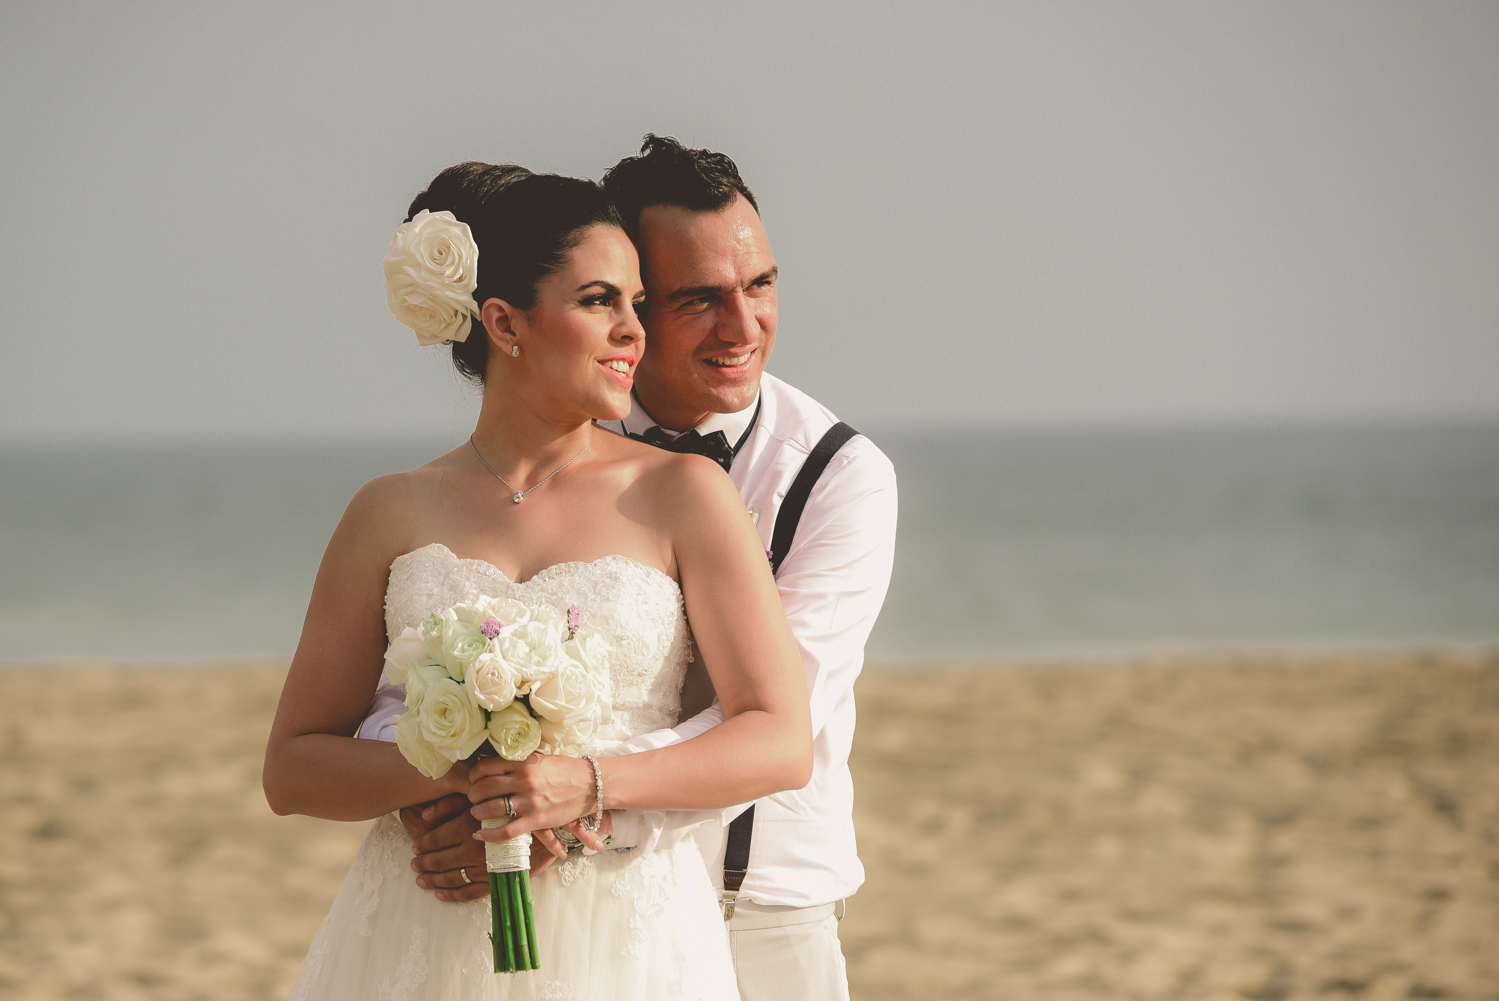 Mariana + Alex